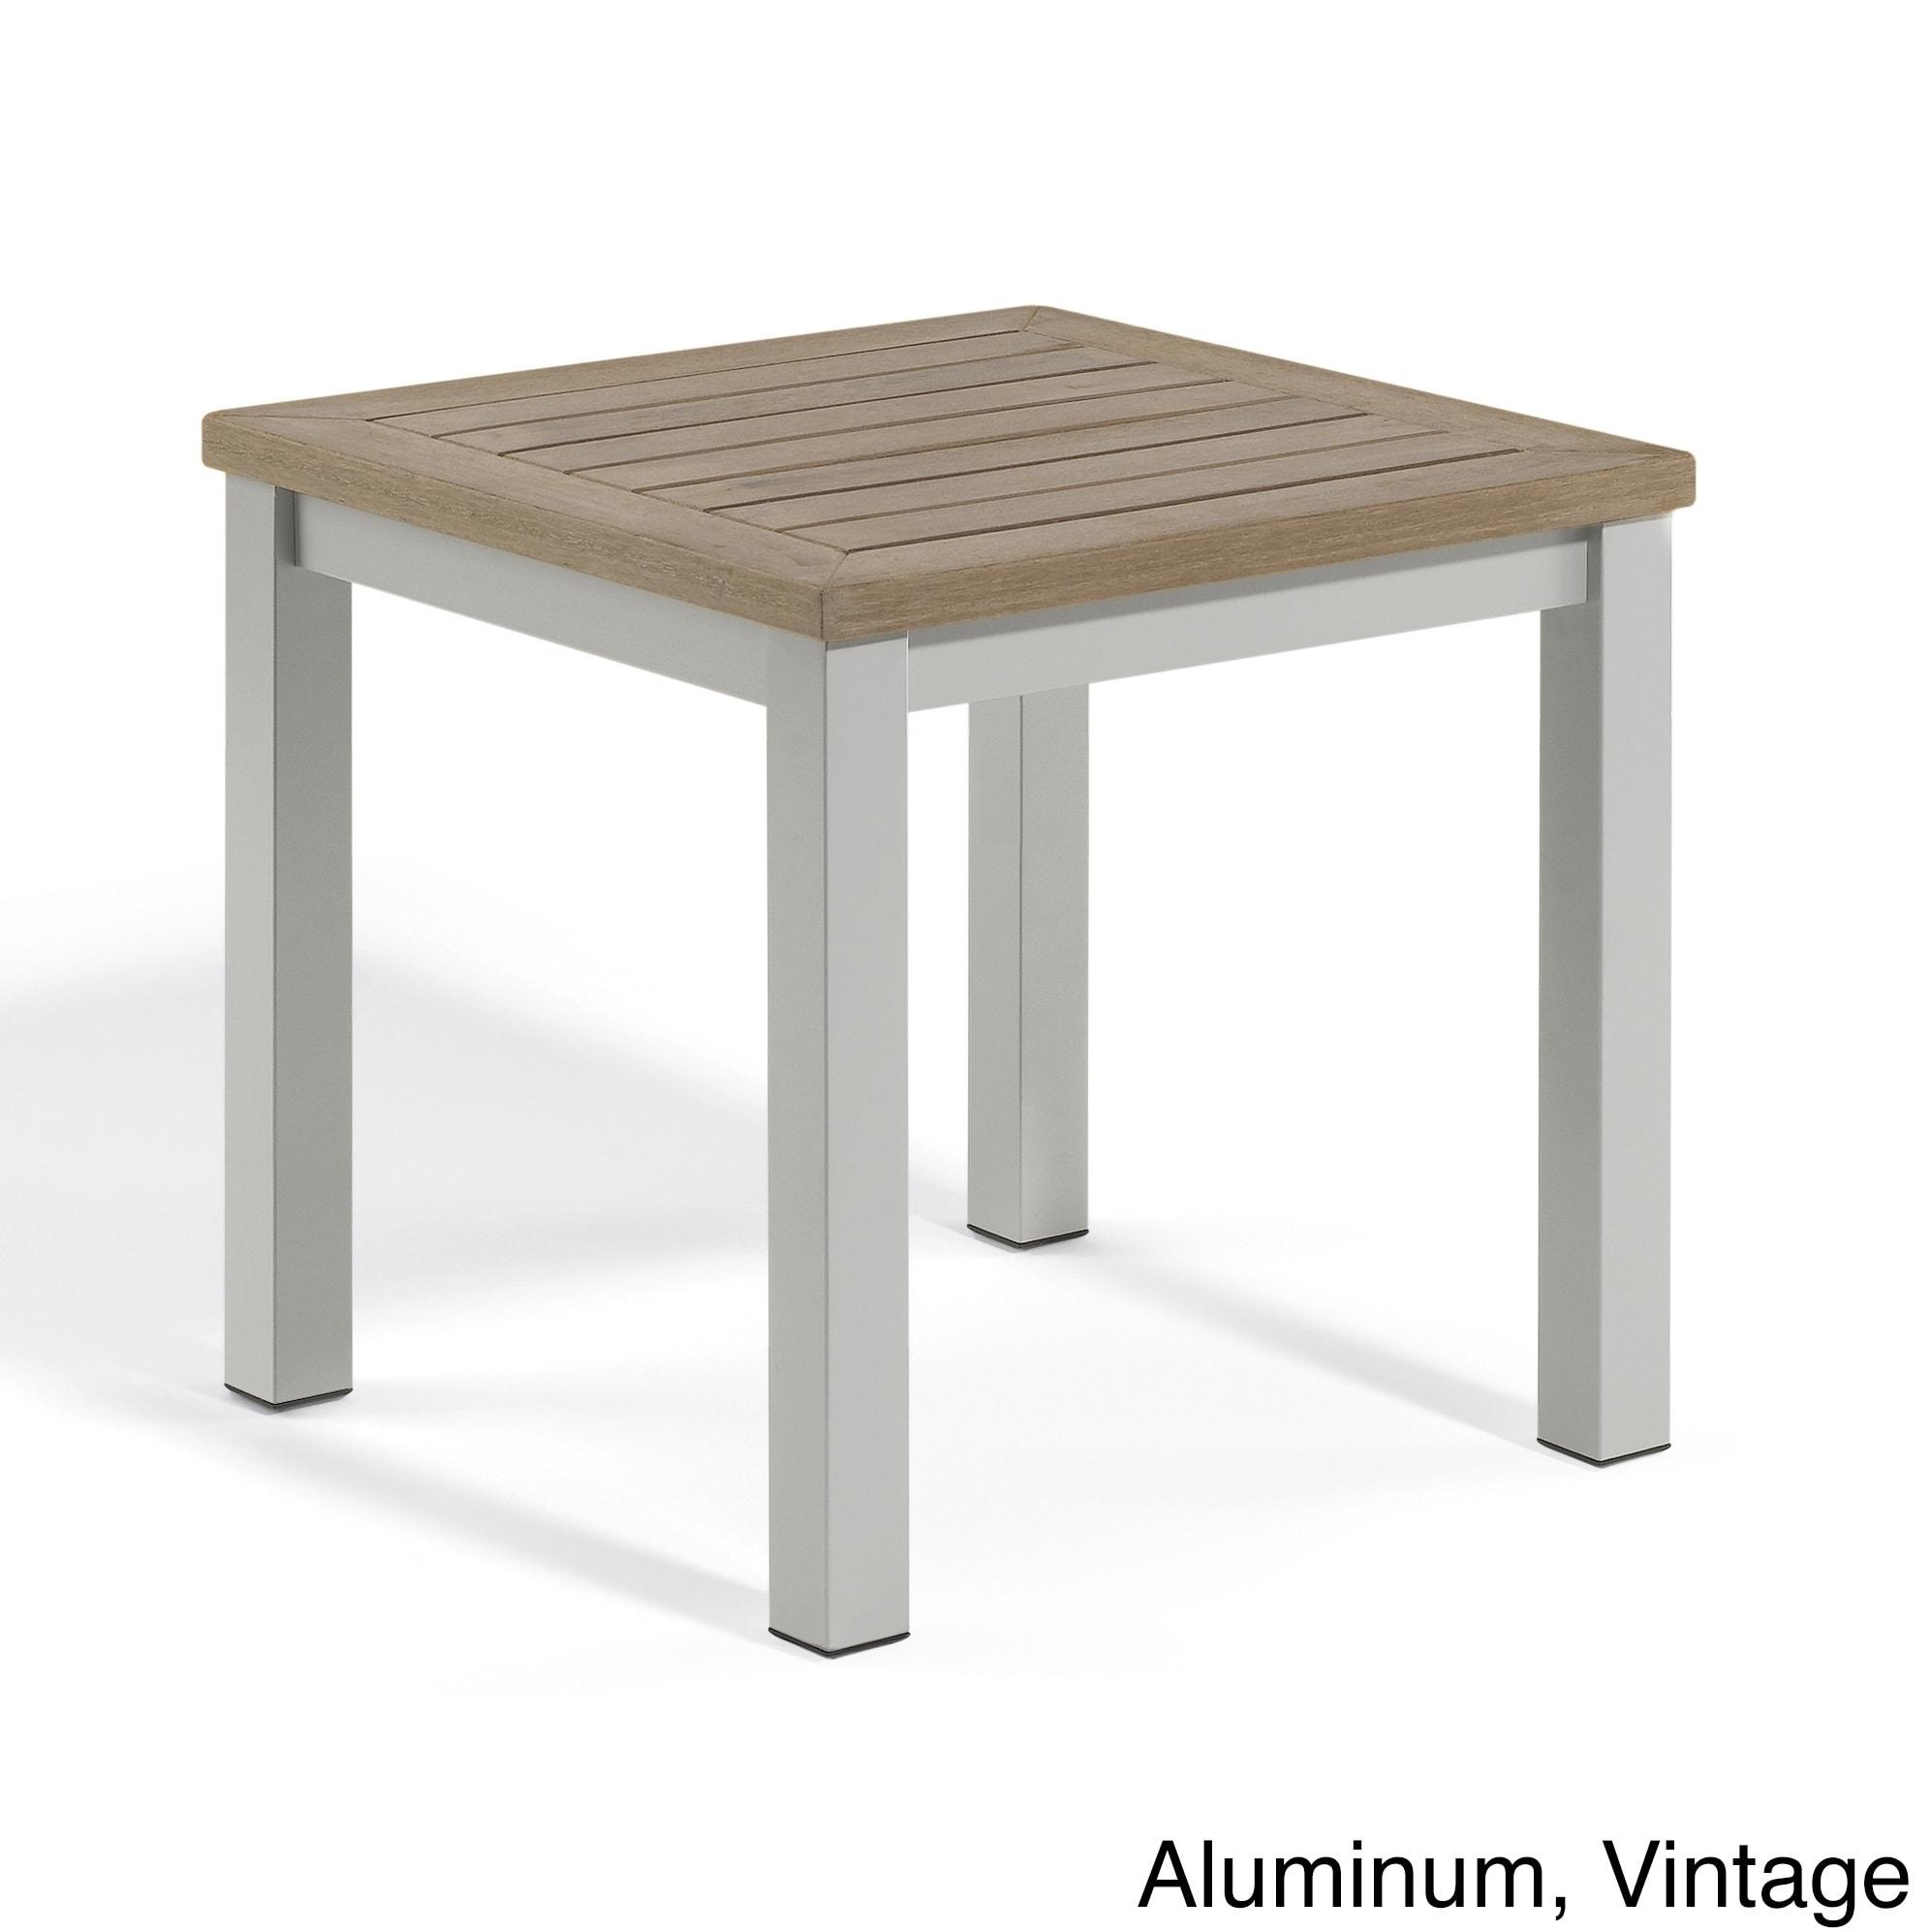 Oxford Garden Travira End Table (Aluminum/Vintage), Grey,...